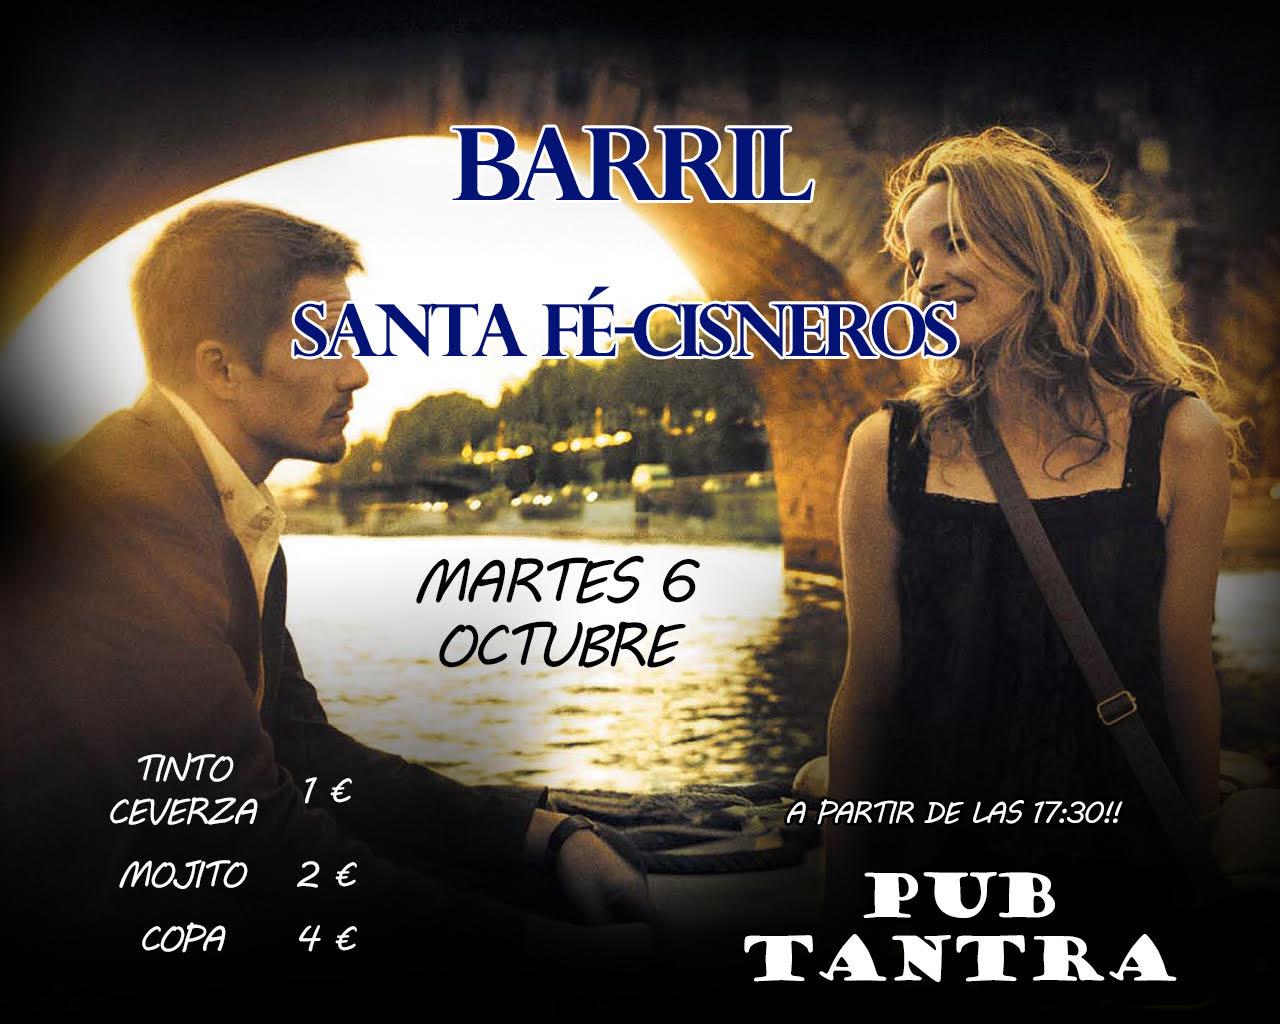 Barril Santa Fe-Cisneros